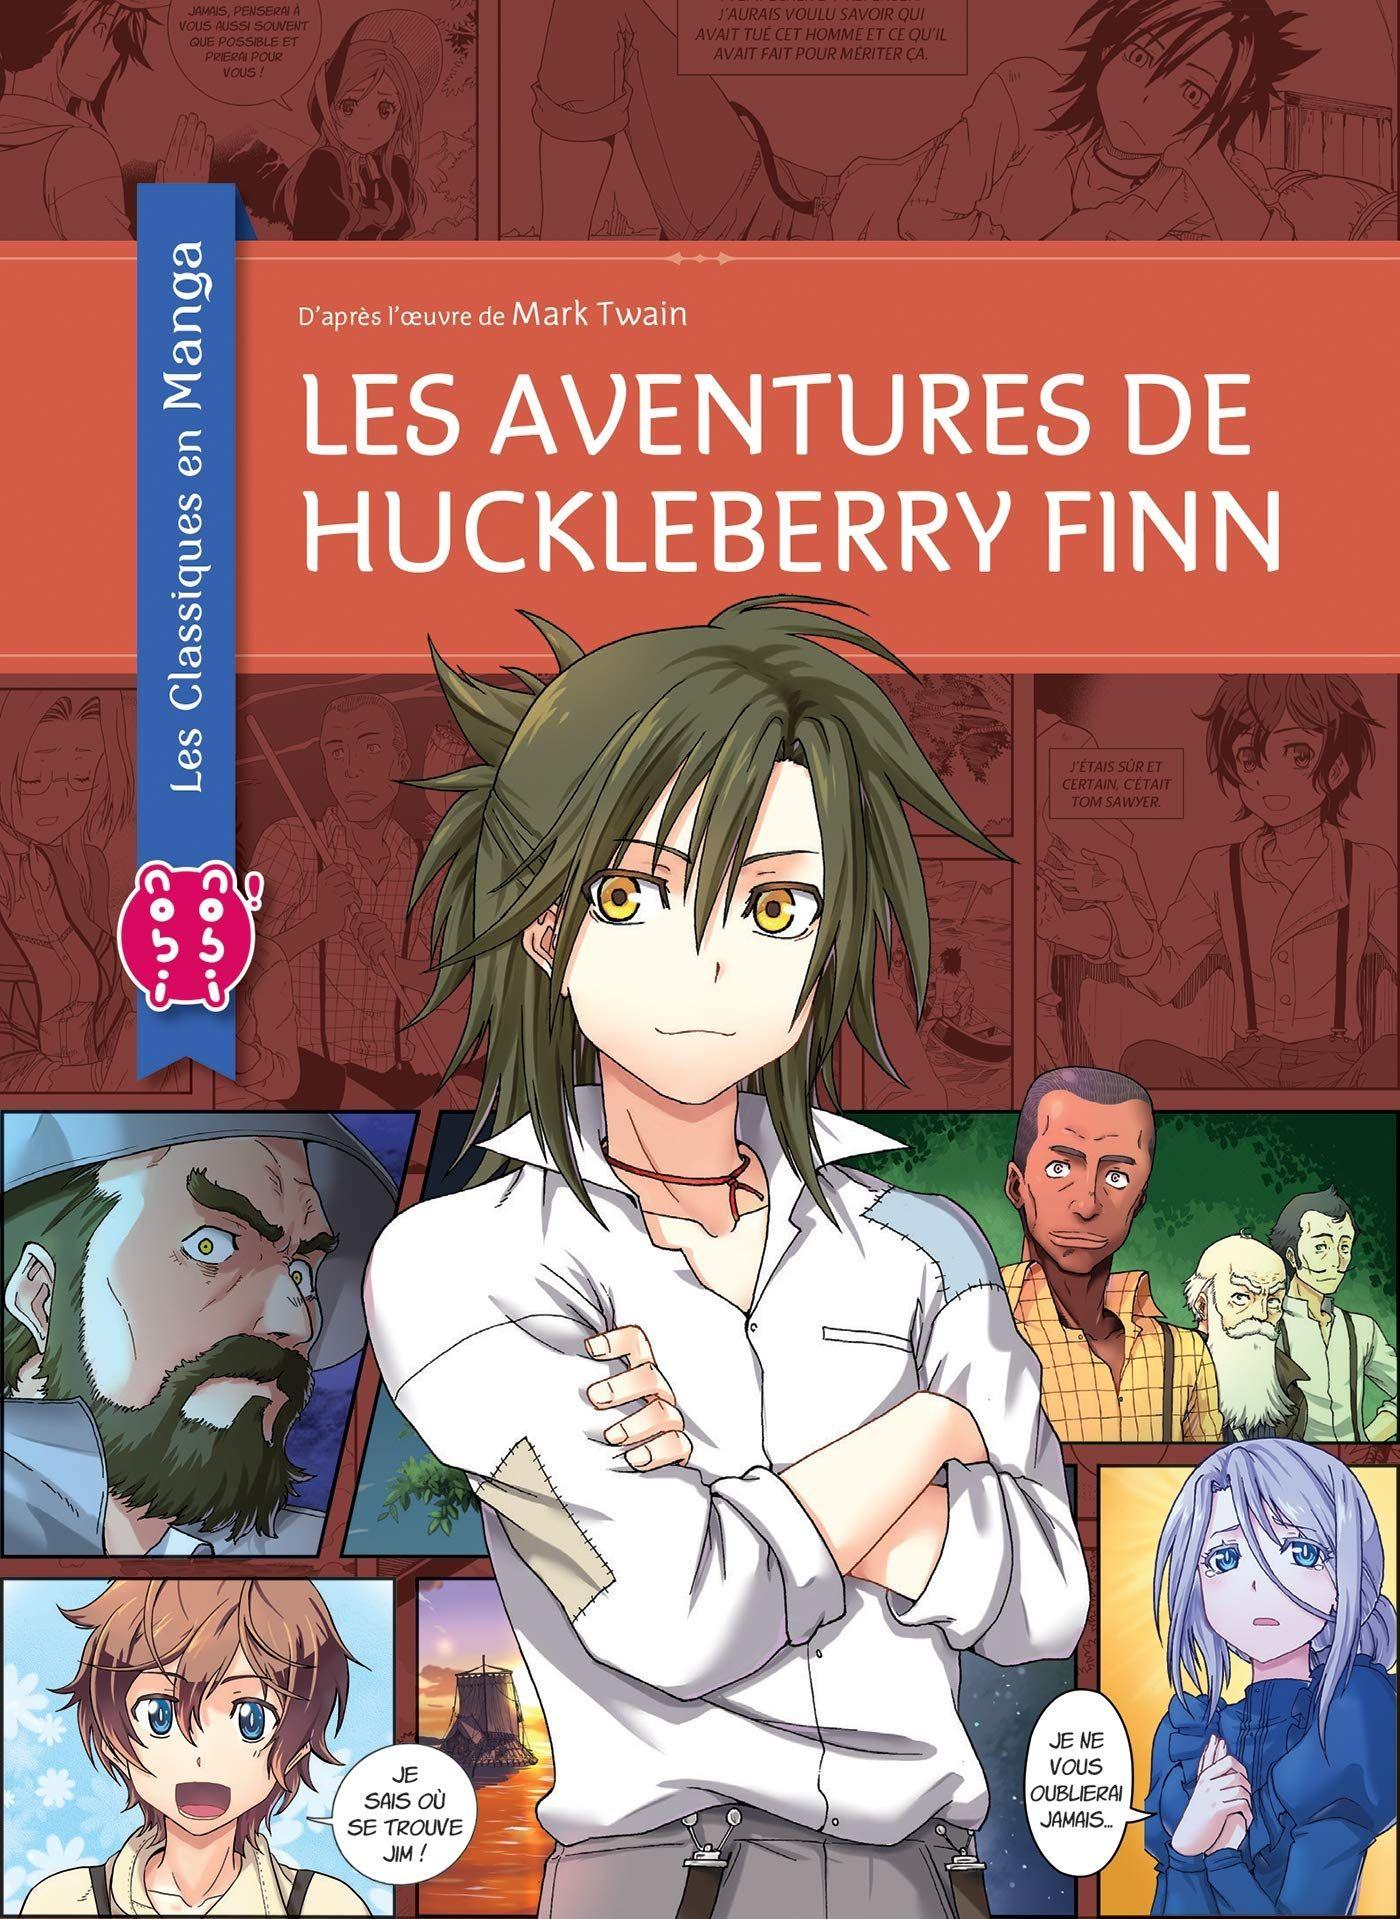 Sortie Manga au Québec JUIN 2021 Aventures-huckleberry-finn-nobi